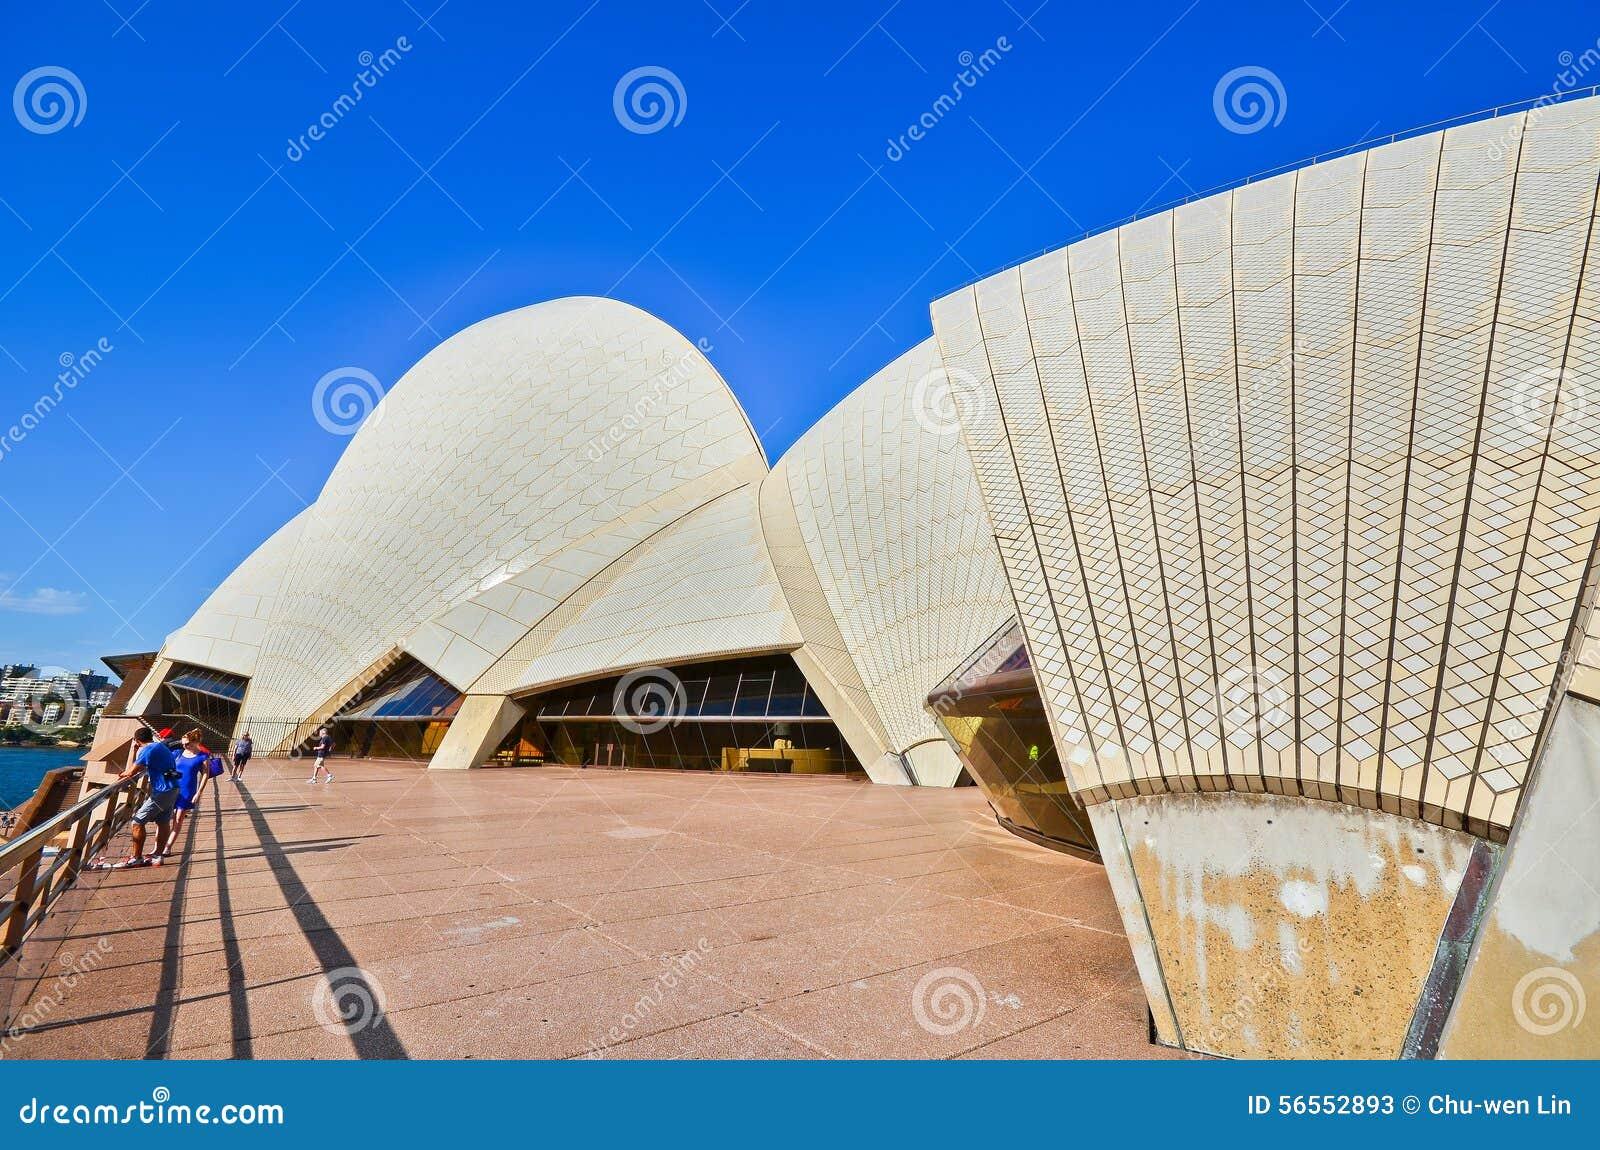 Download Άποψη της Όπερας του Σίδνεϊ Εκδοτική Στοκ Εικόνες - εικόνα από σκιά, εικονίδιο: 56552893